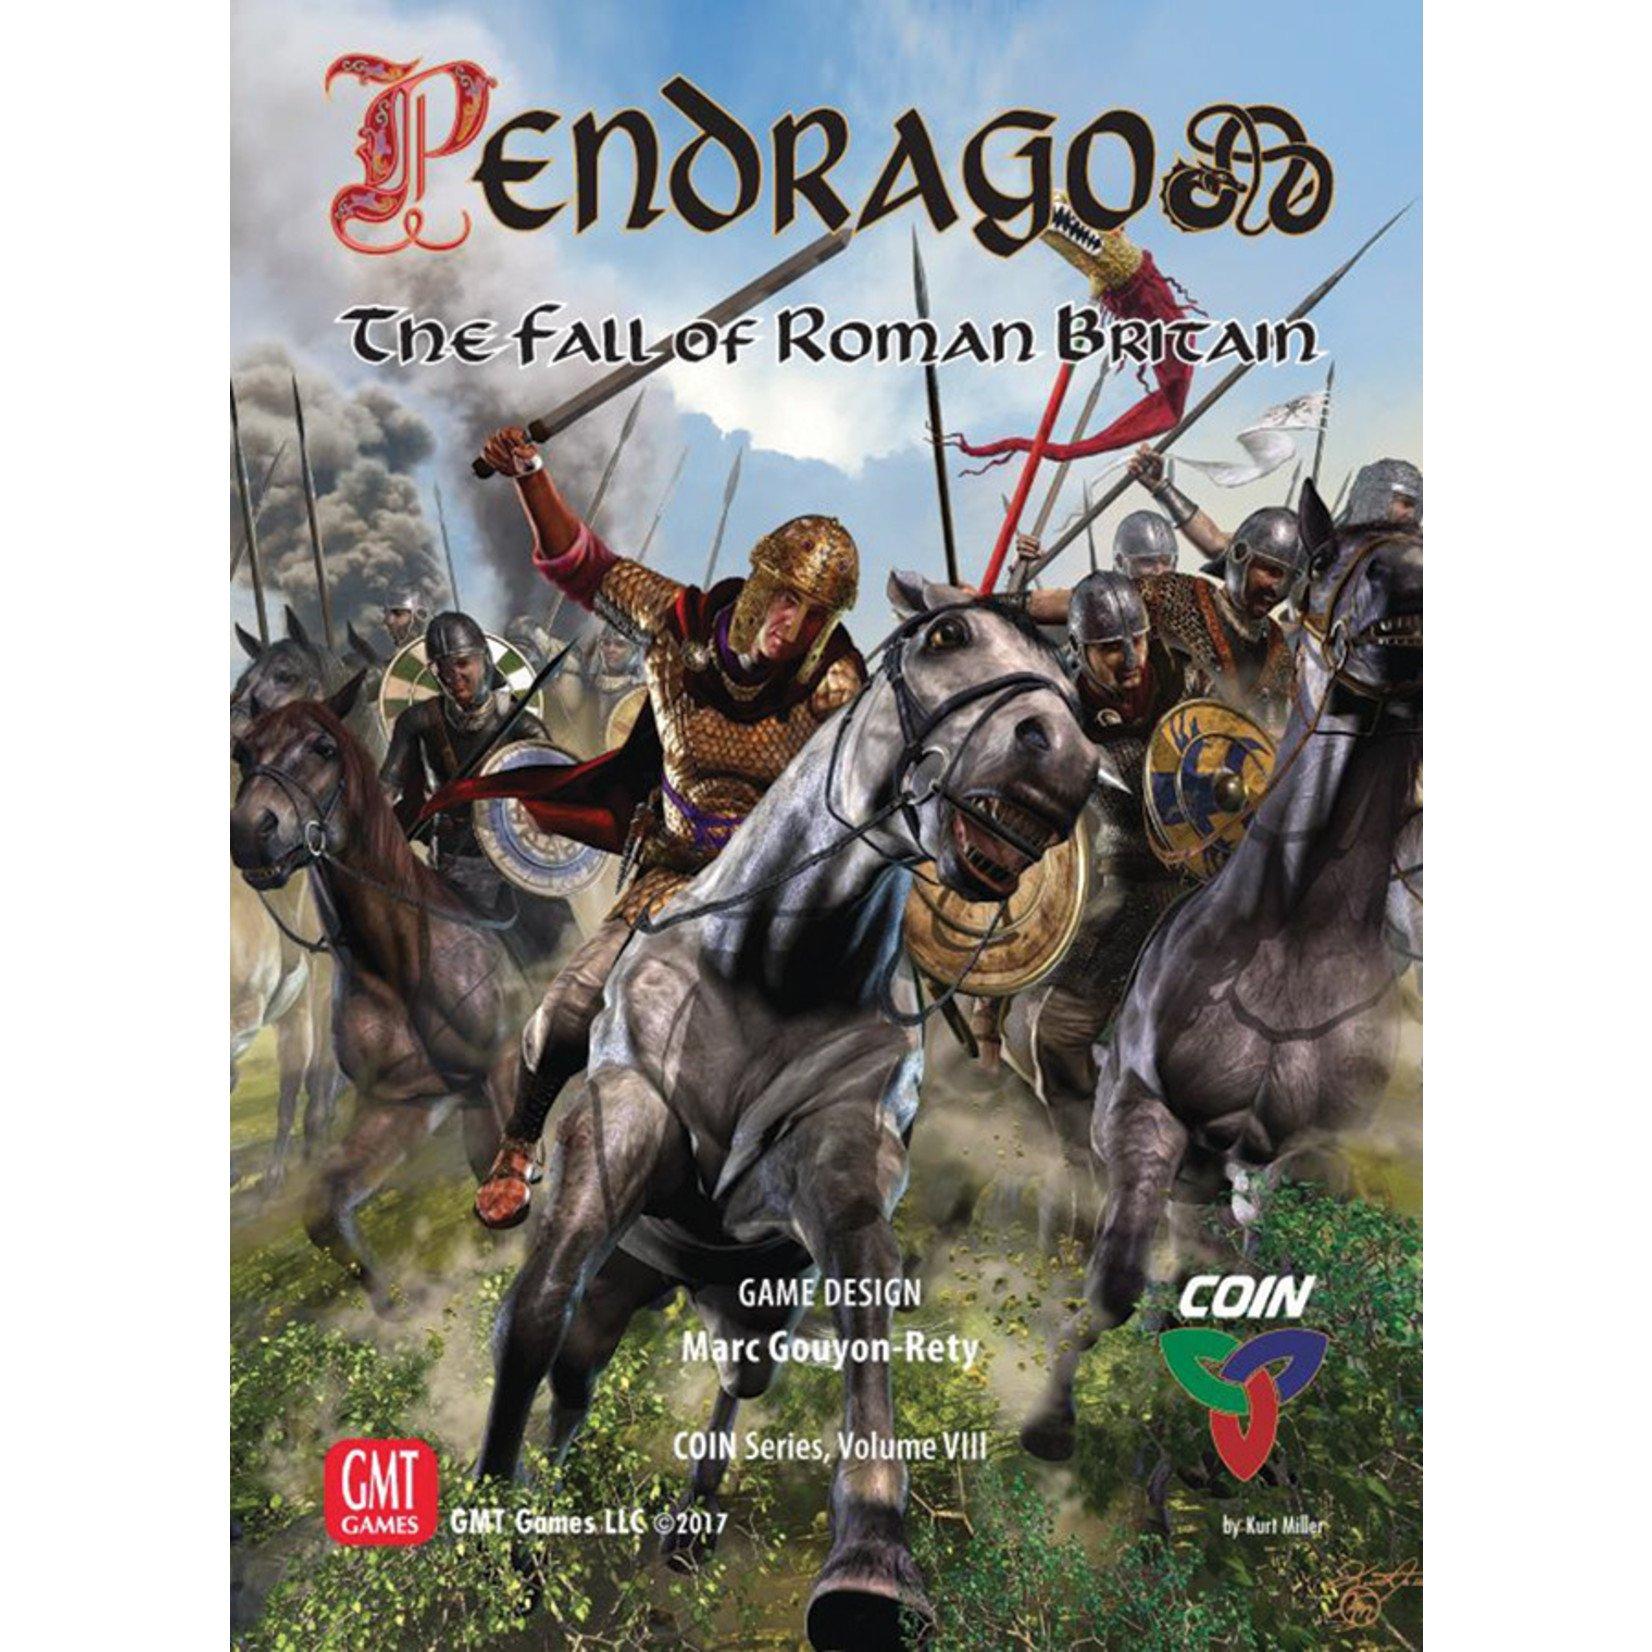 GMT Games COIN: Pendragon - The Fall of Roman Britain